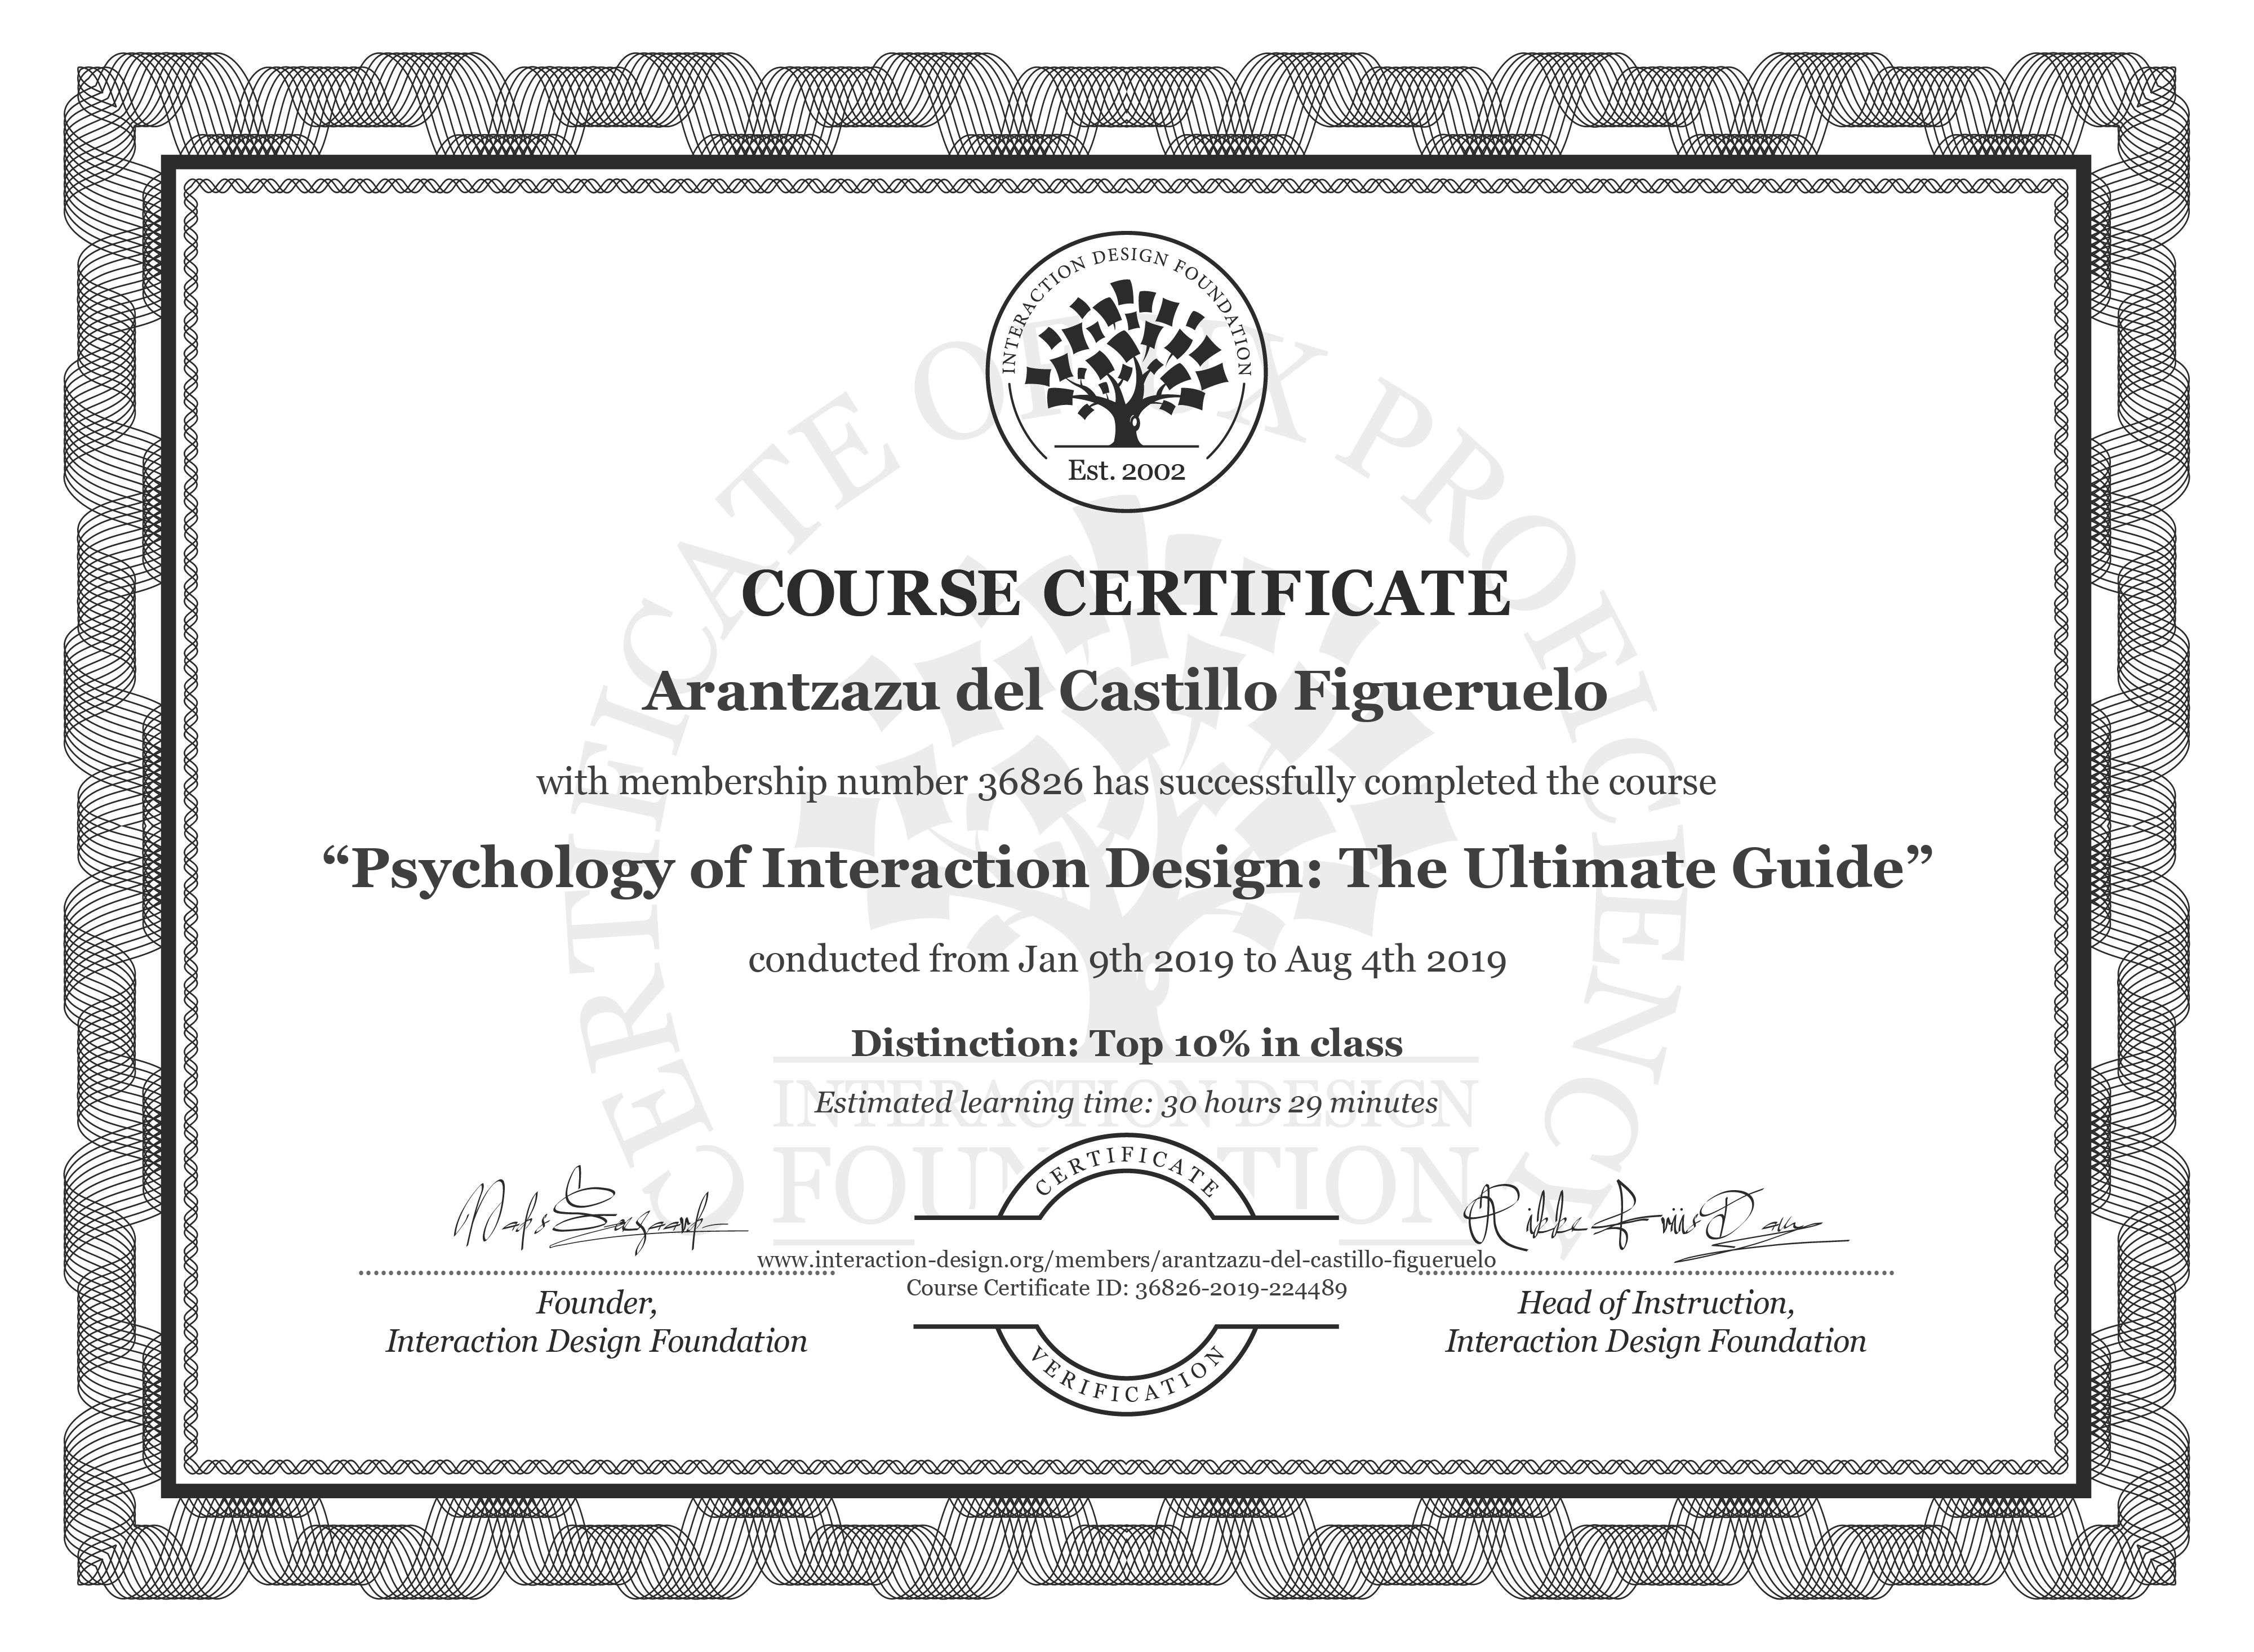 Arantzazu del Castillo Figueruelo's Course Certificate: Psychology of Interaction Design: The Ultimate Guide